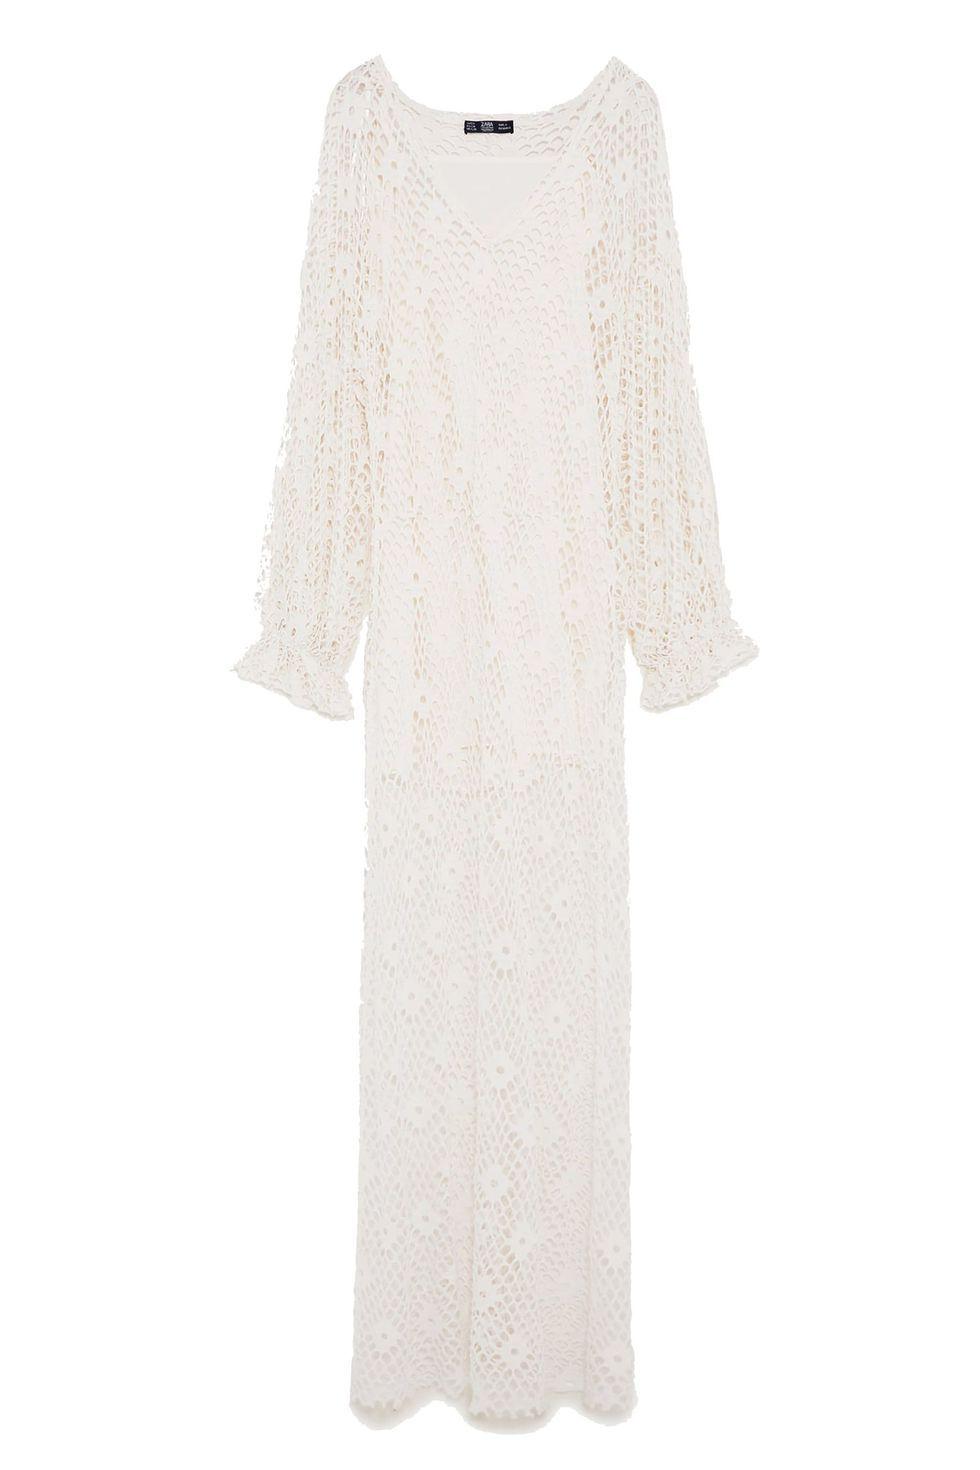 10 Beach Wedding Dresses You Can Buy Off The Rack Designer Wedding Dresses Beach Dresses Bridal Fashion Week